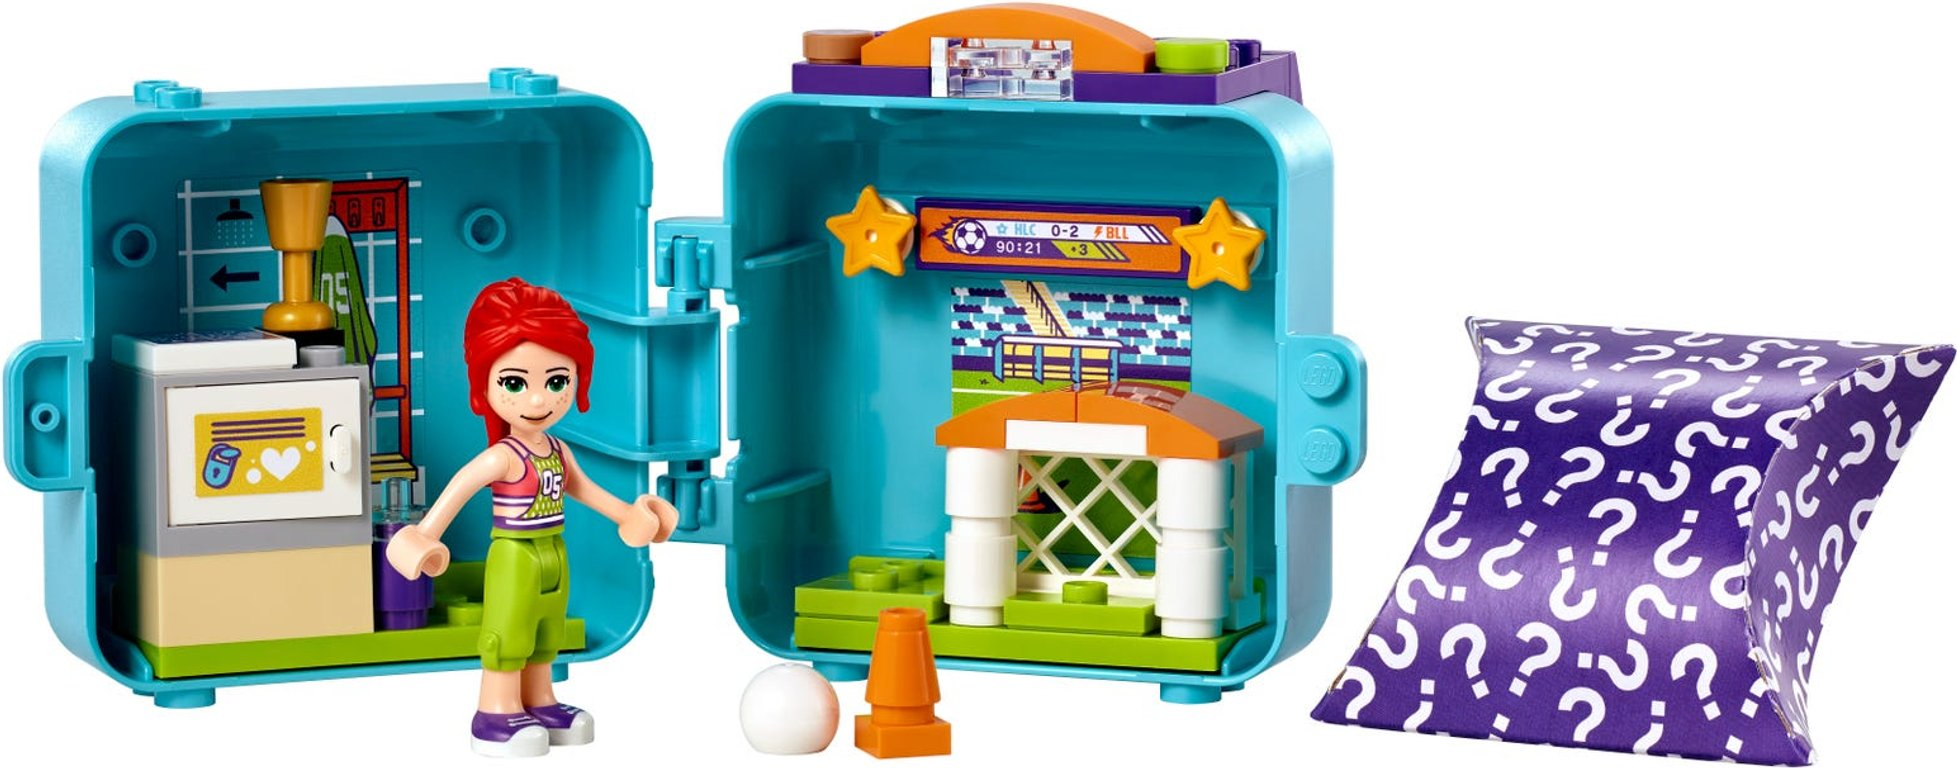 LEGO® Friends Mia's Soccer Cube components